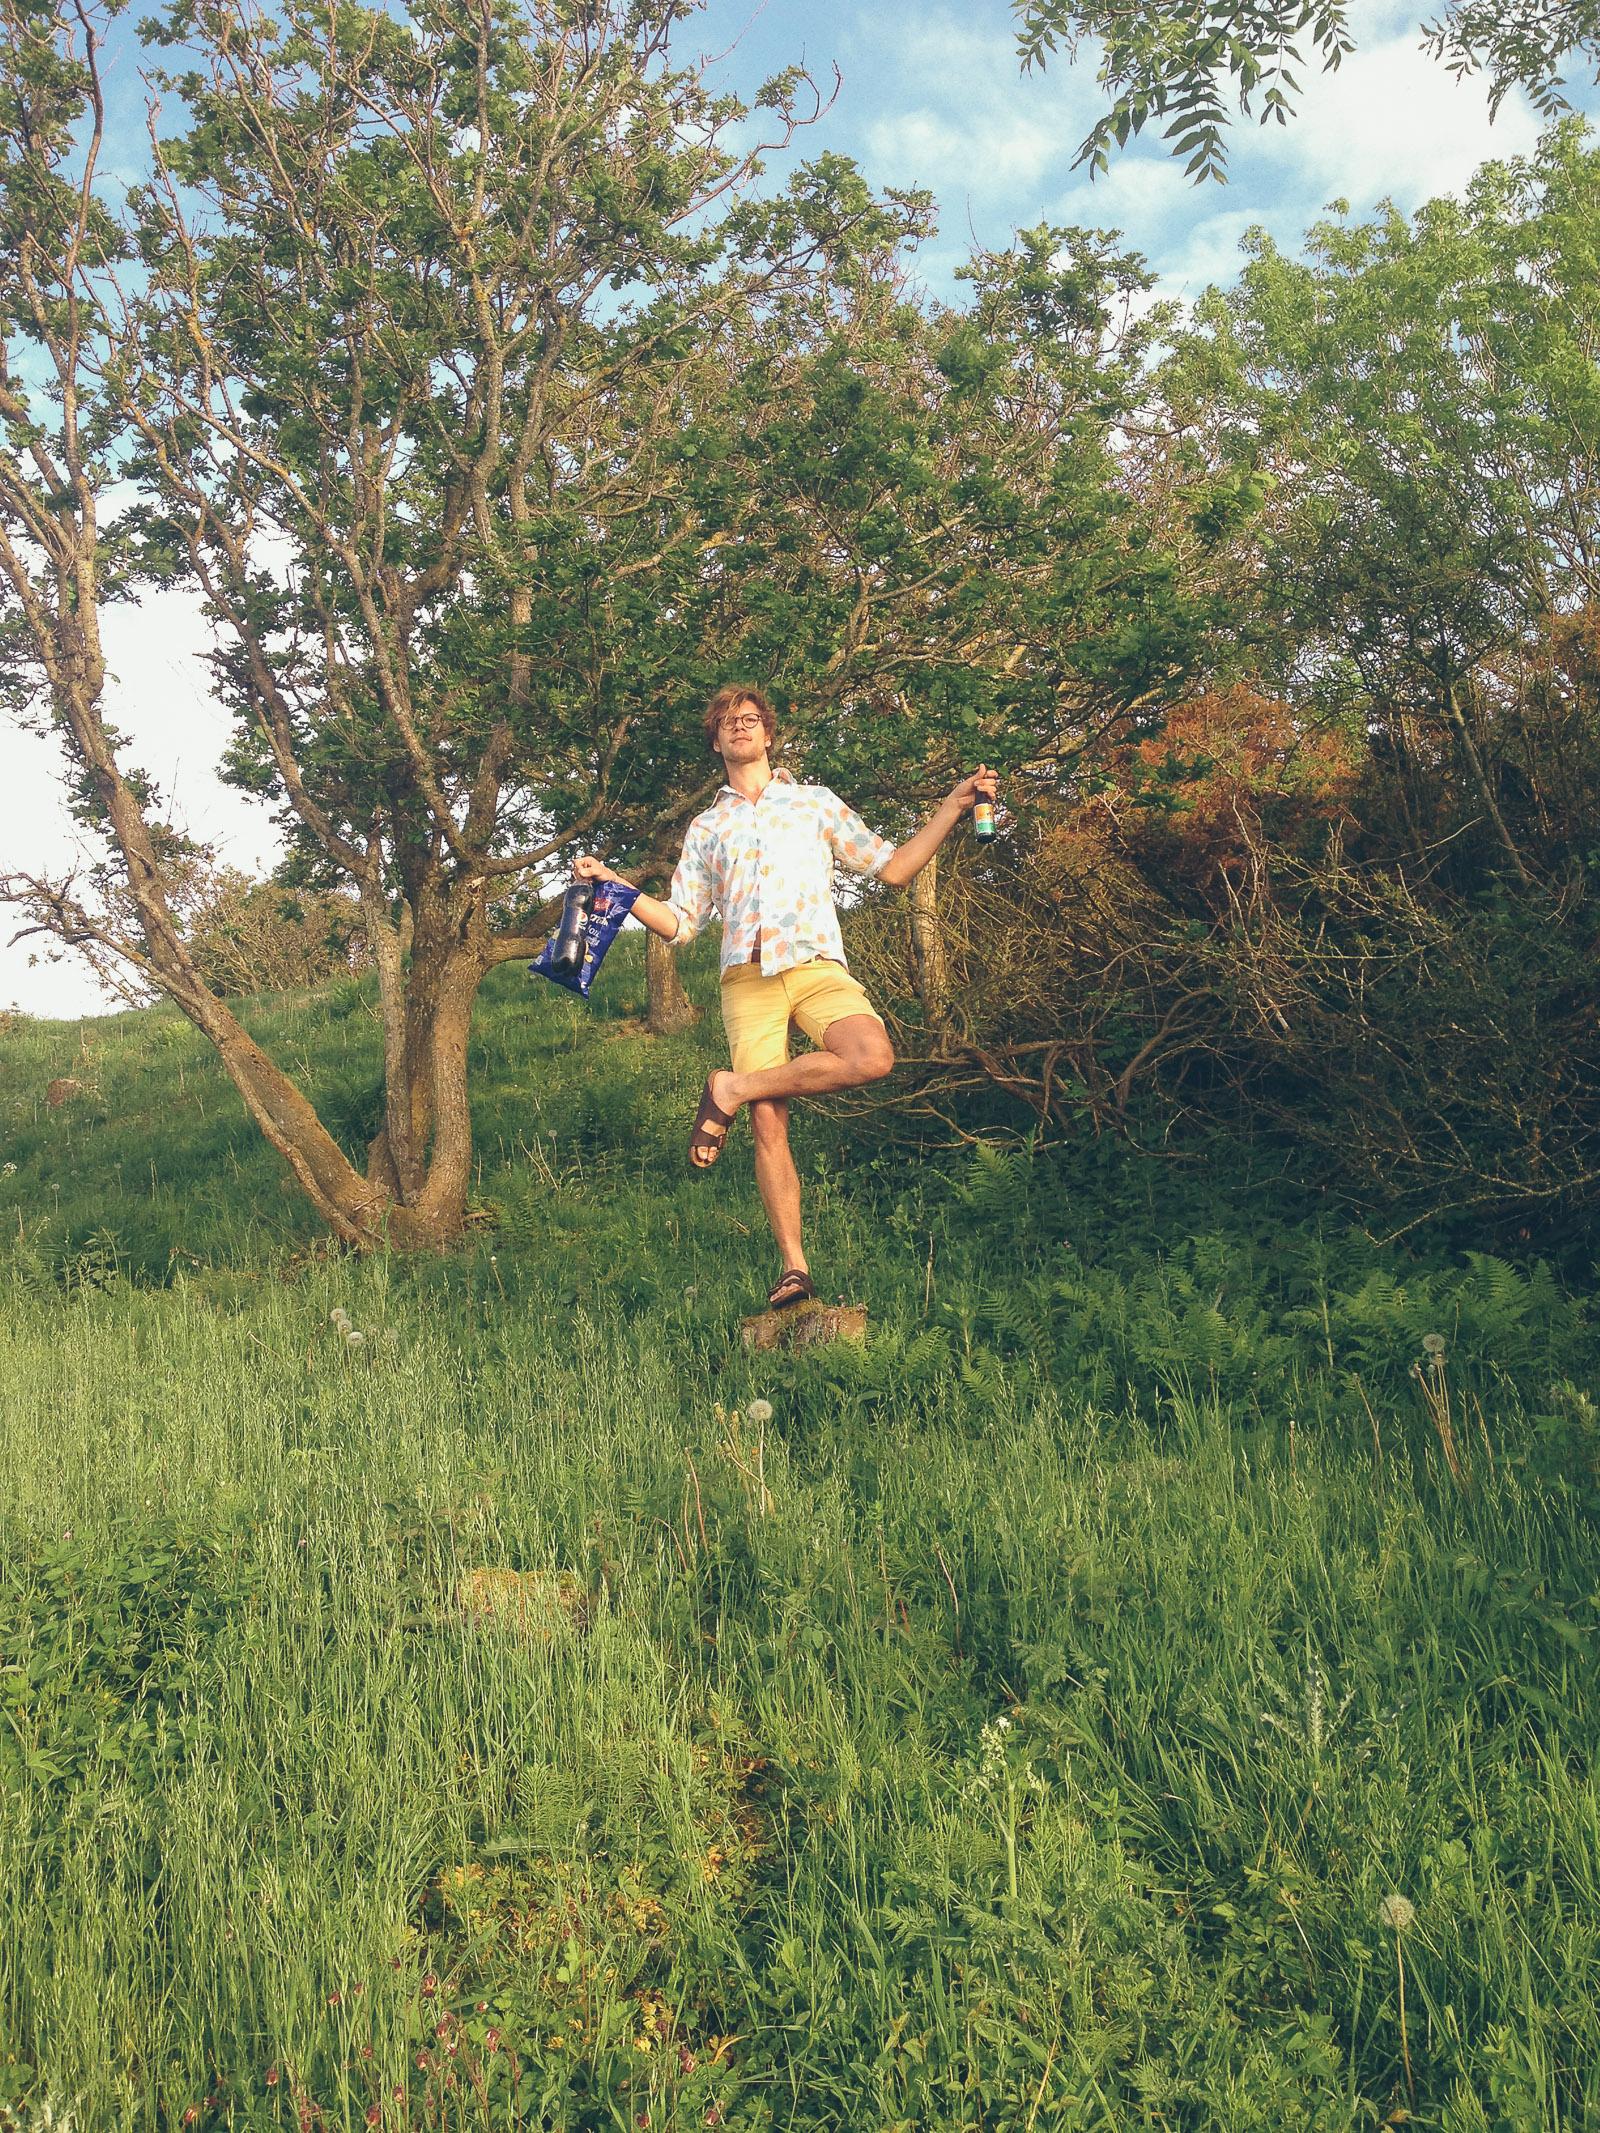 Sunshinestories-surf-travel-blog-IMG_5735